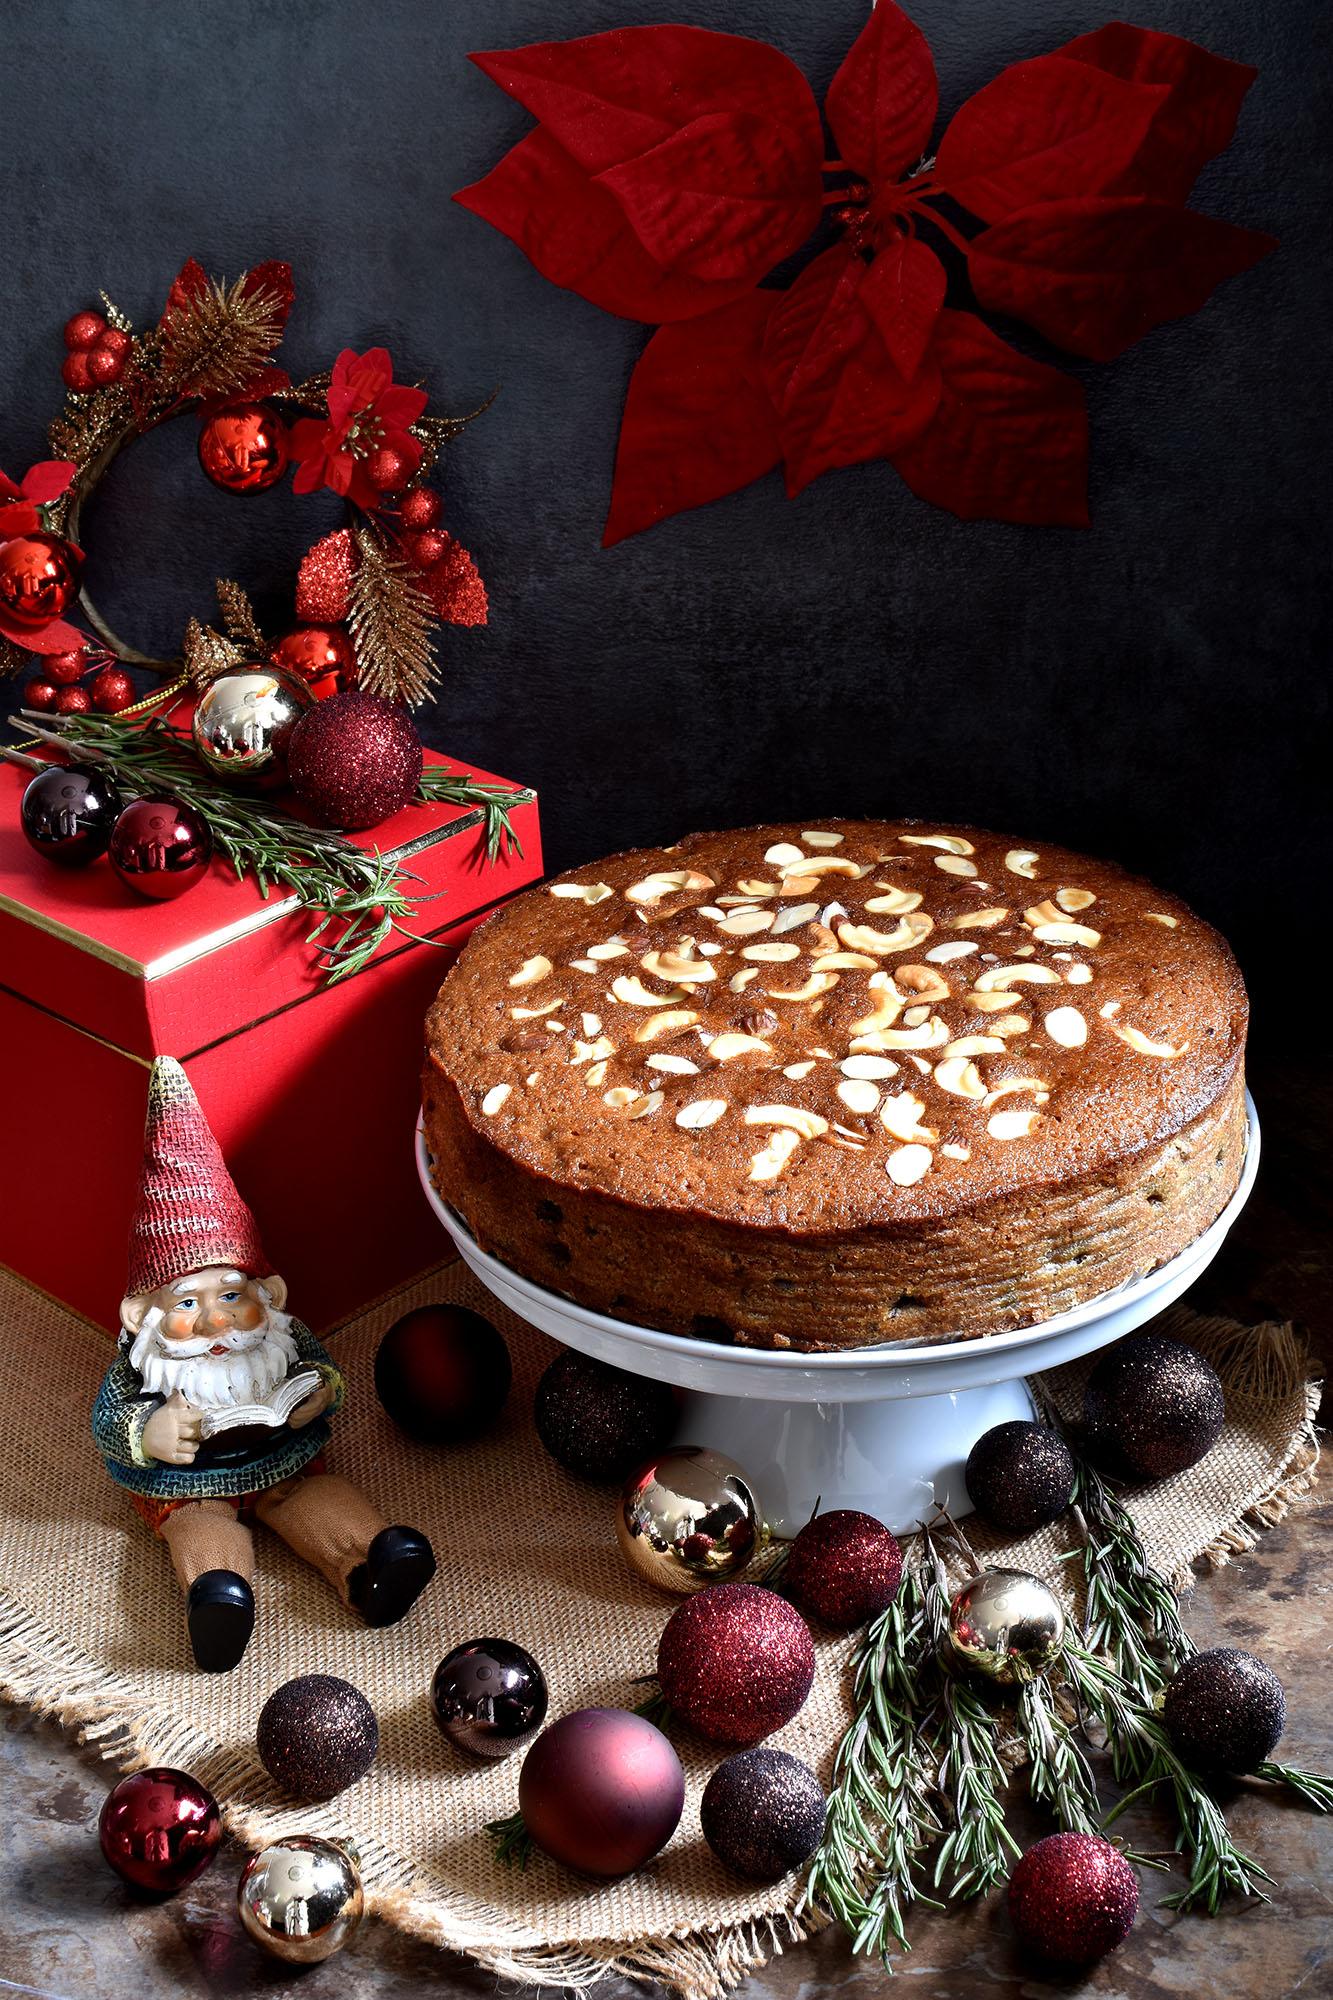 christmas fruit cake non alcoholic pepper delight - Christmas Fruit Cake Decoration